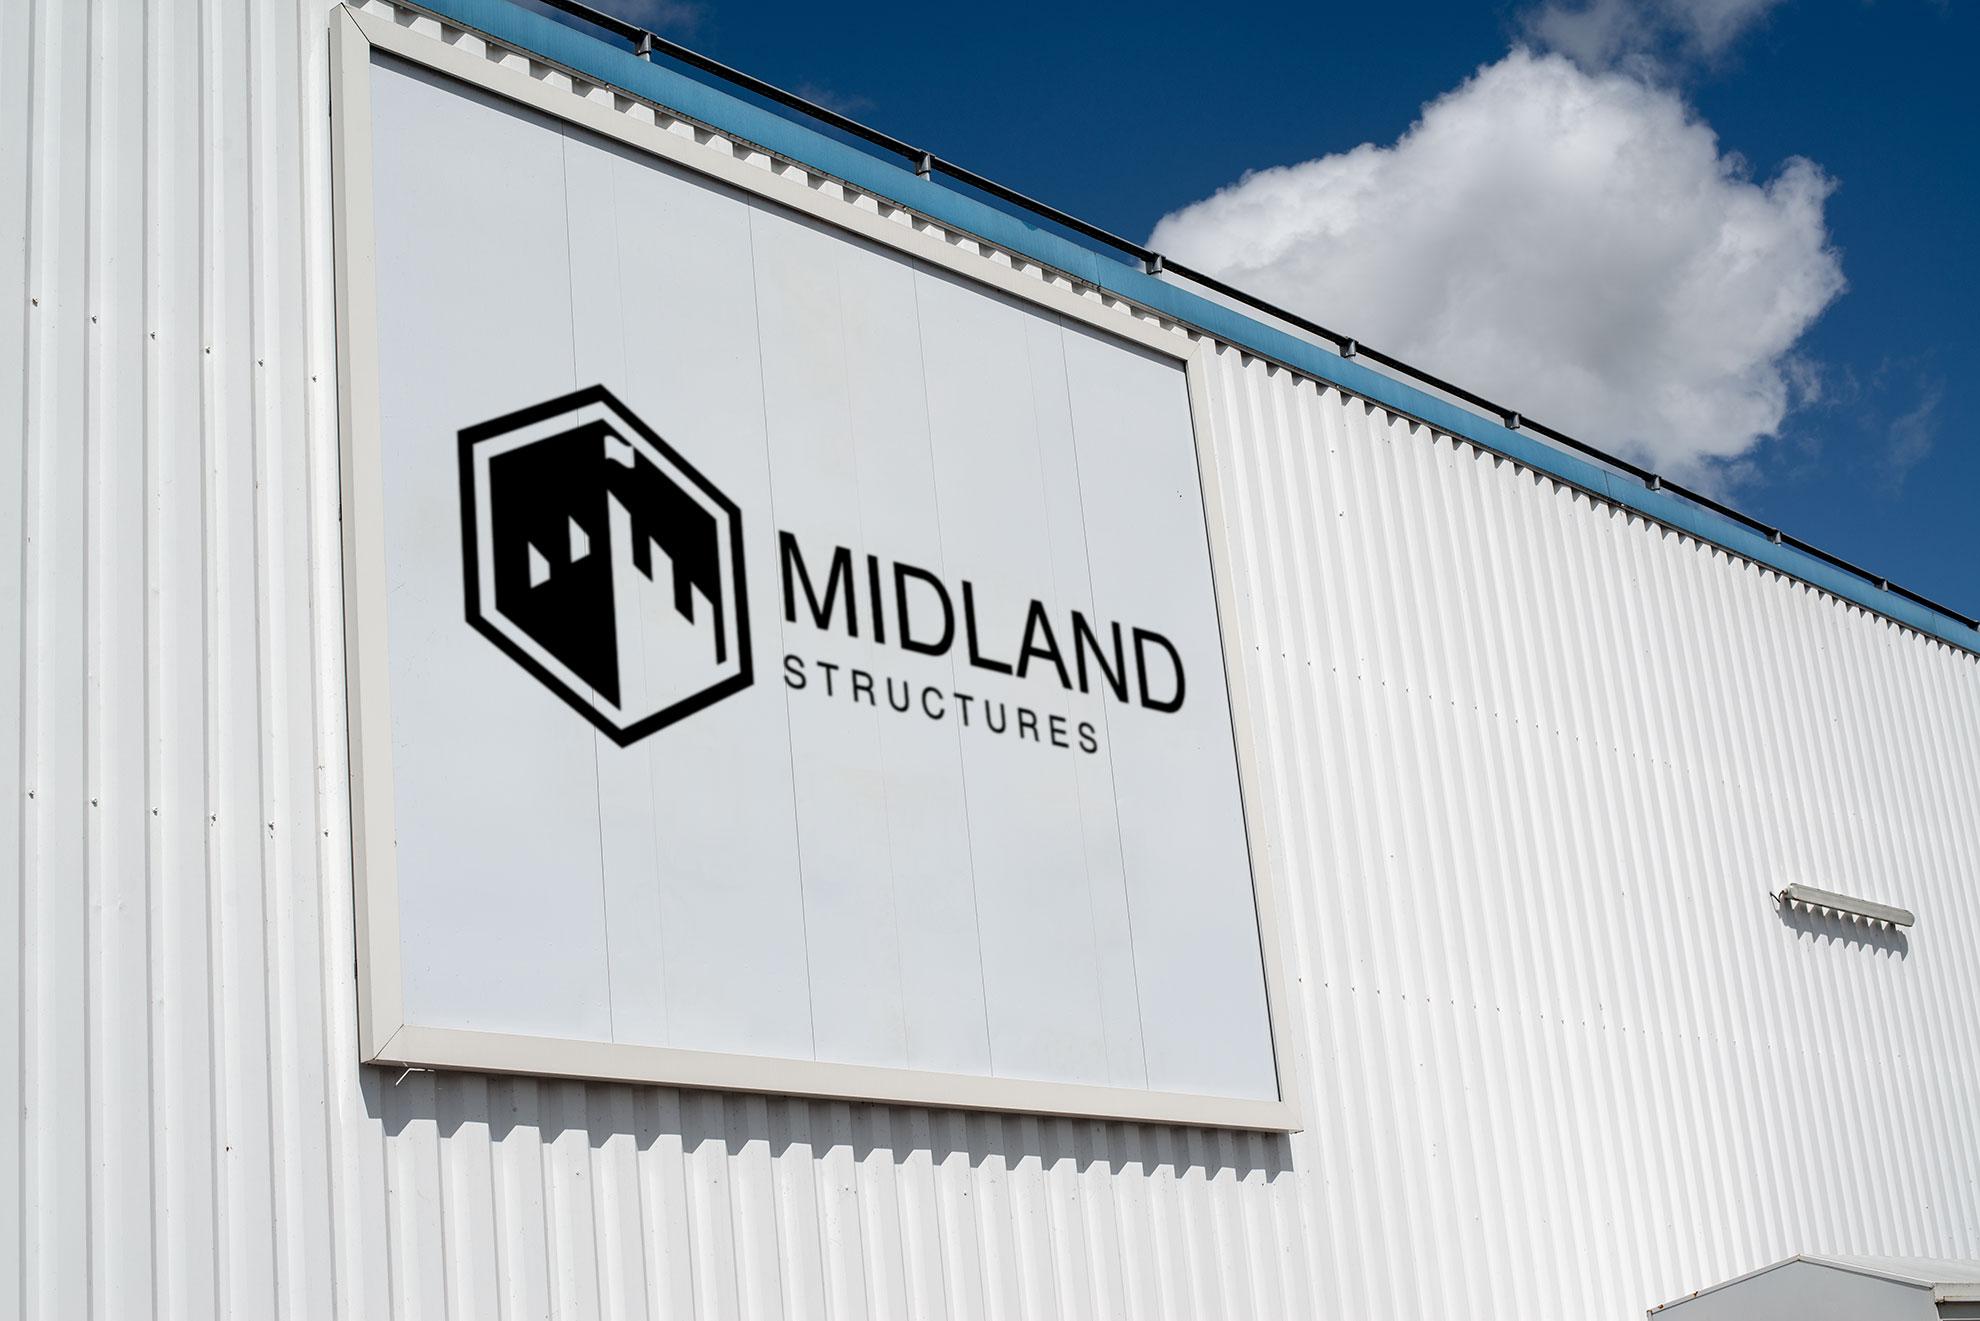 Midland Structures, Bedford